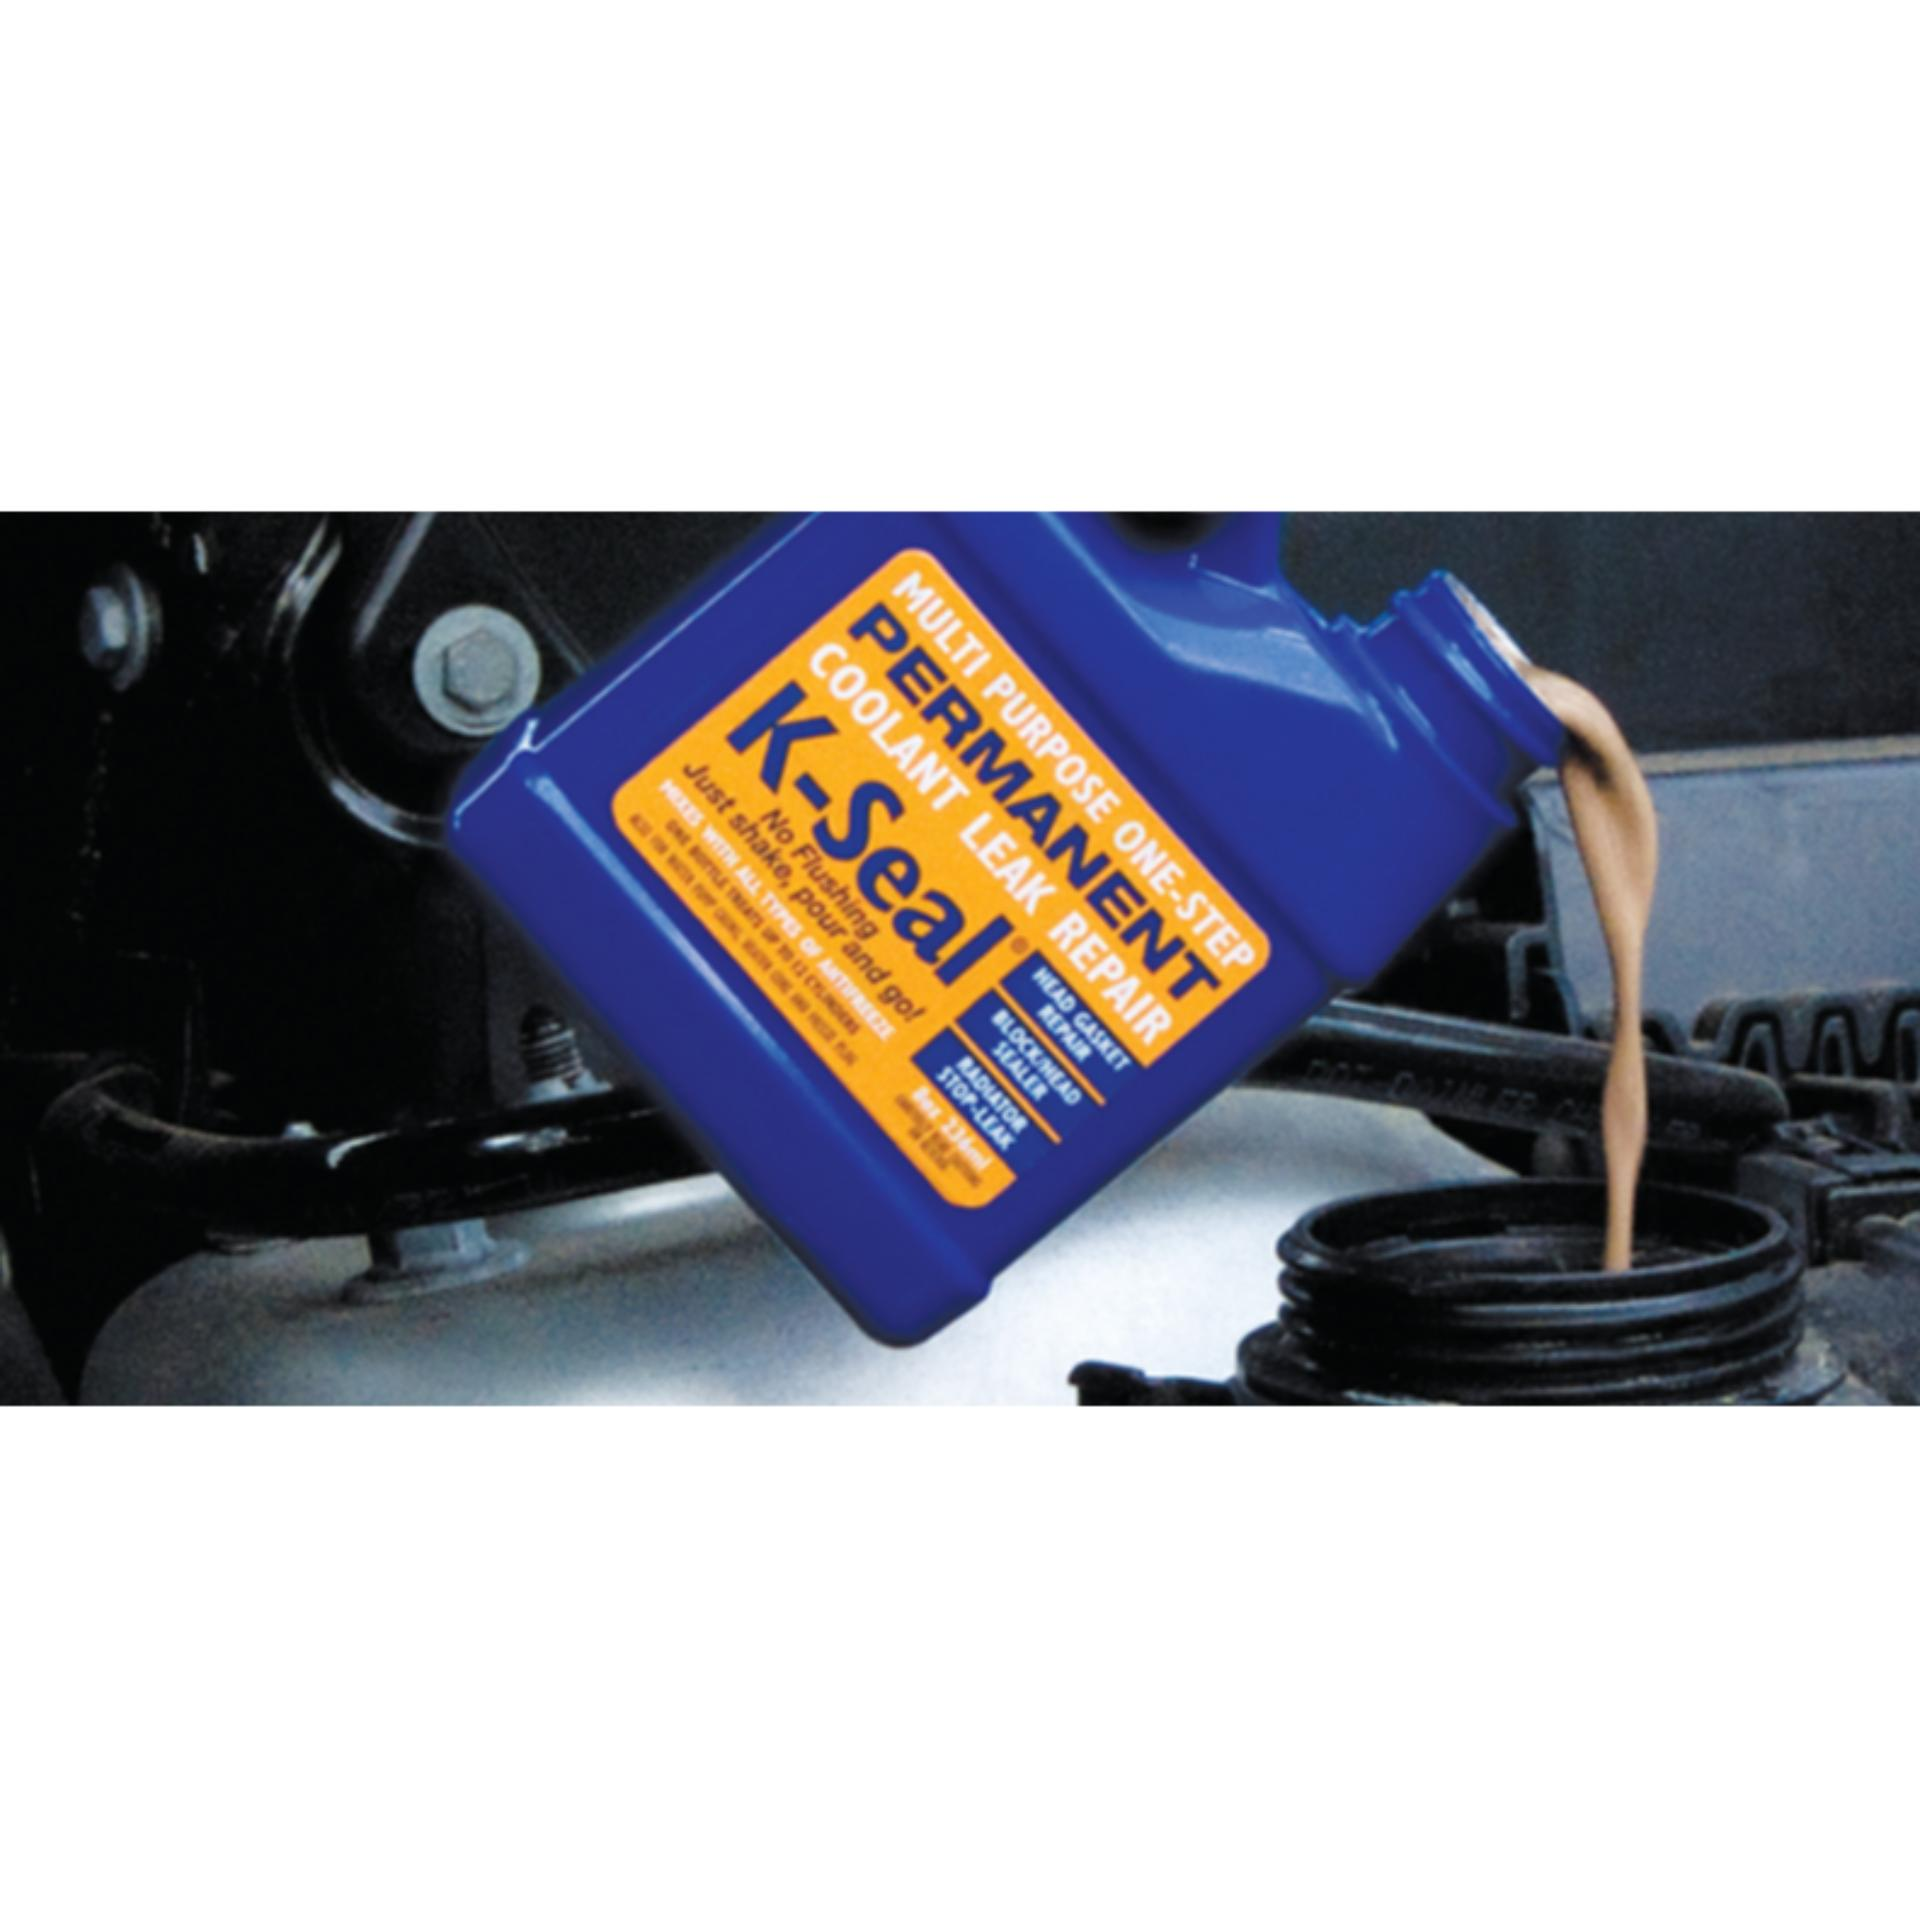 K-SEAL PERMANENT COOLANT RADIATOR HEAD GASKET LEAK REPAIR